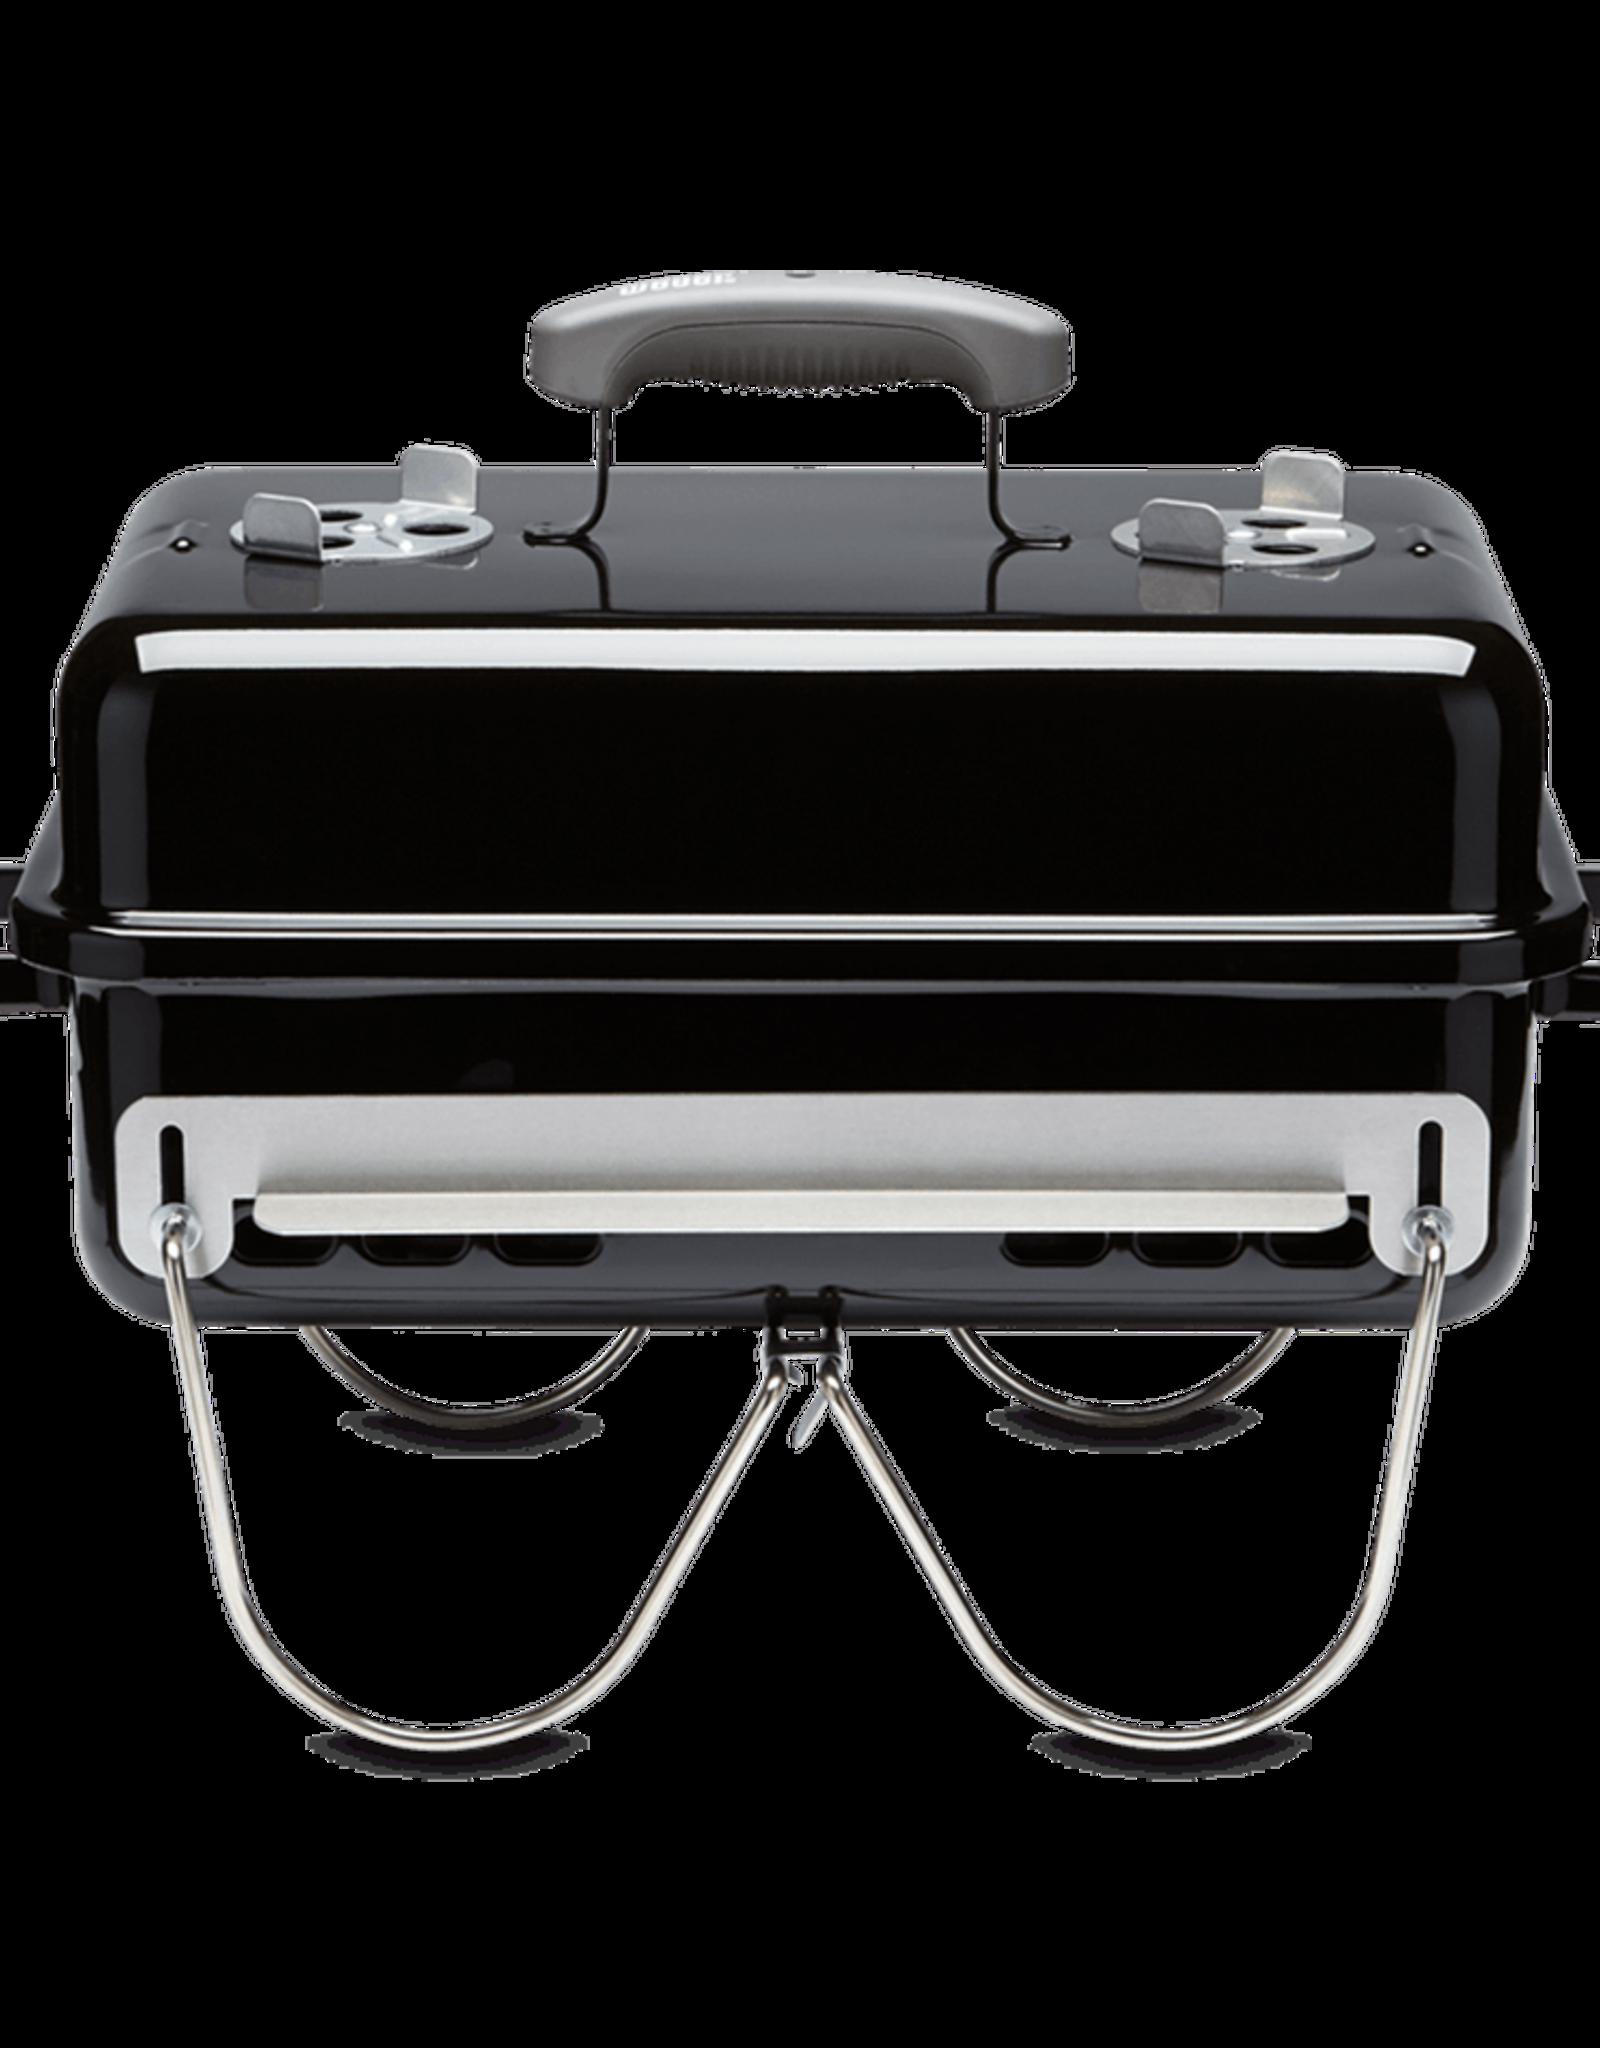 Weber Go-Anywhere Charcoal Grill Black